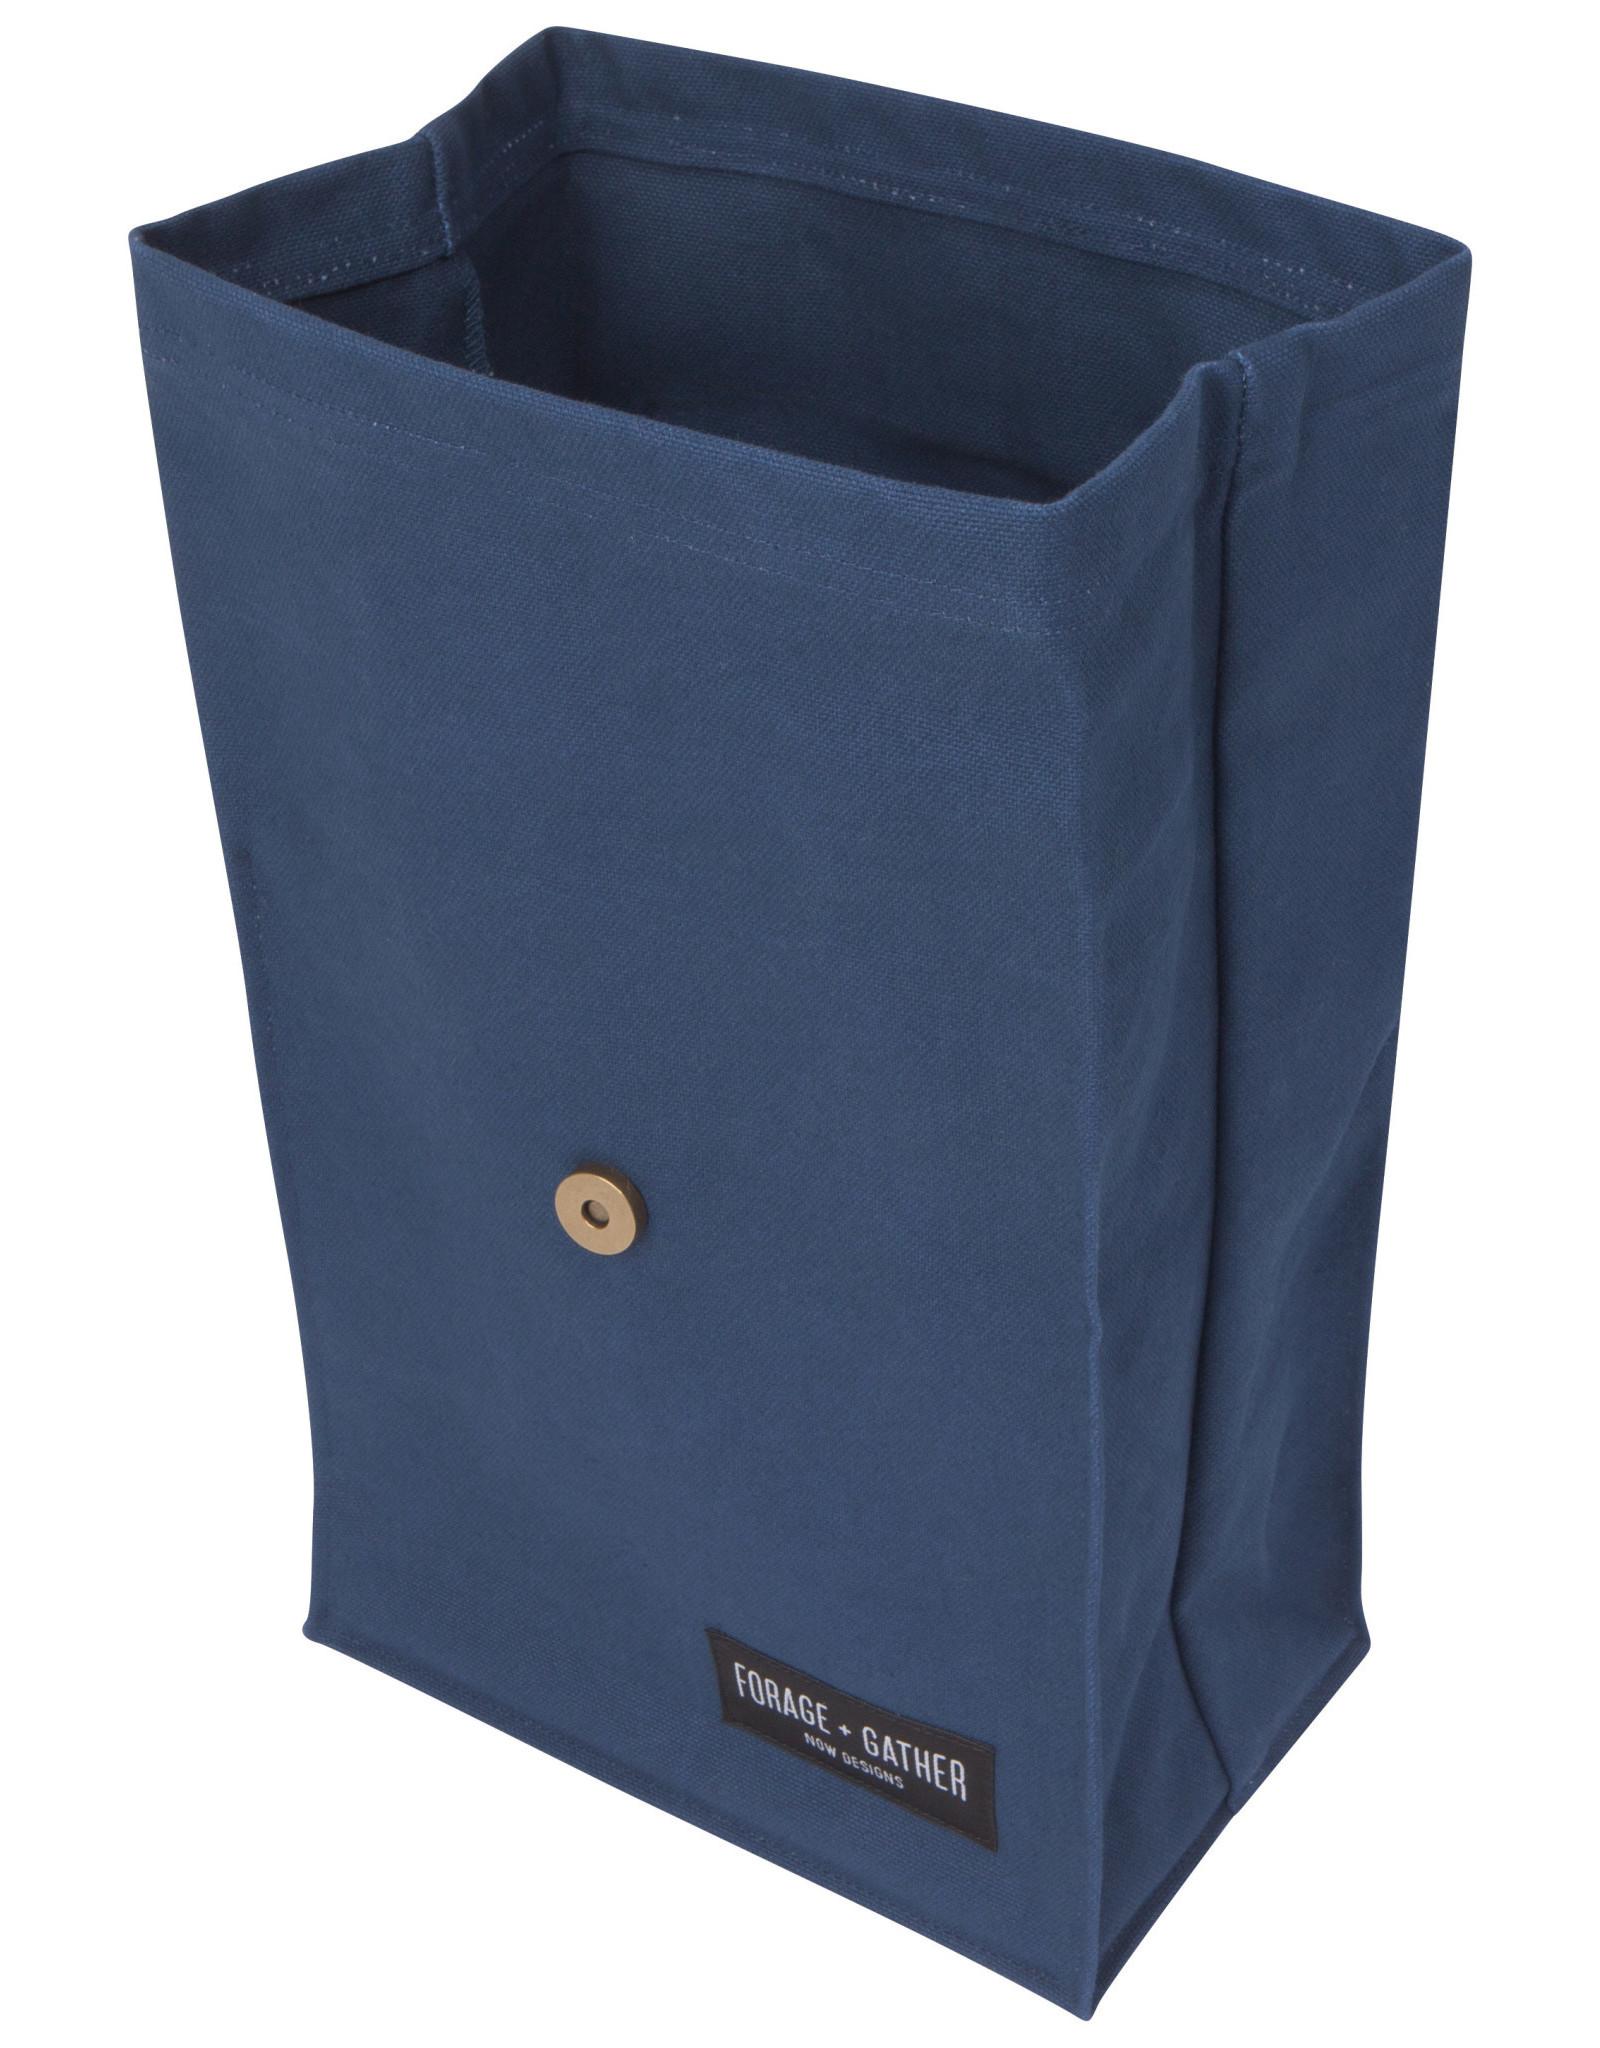 Danica Danica - Forage + Gather Lunch Bag - Blue